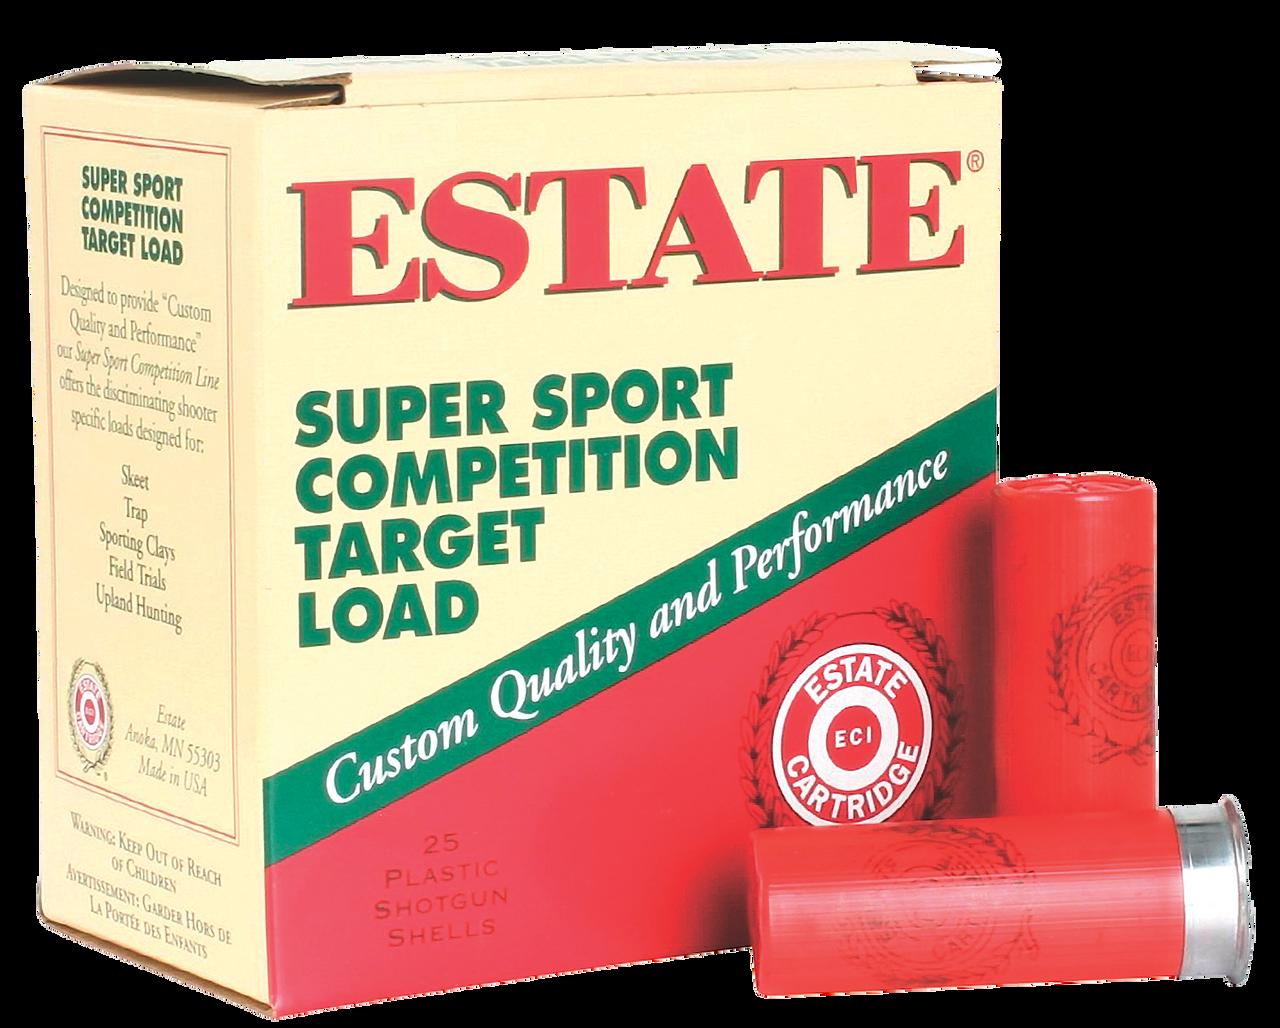 Estate Super Sport, Est Ss12l19    12 Sup Spt Tgt 1oz  25/10